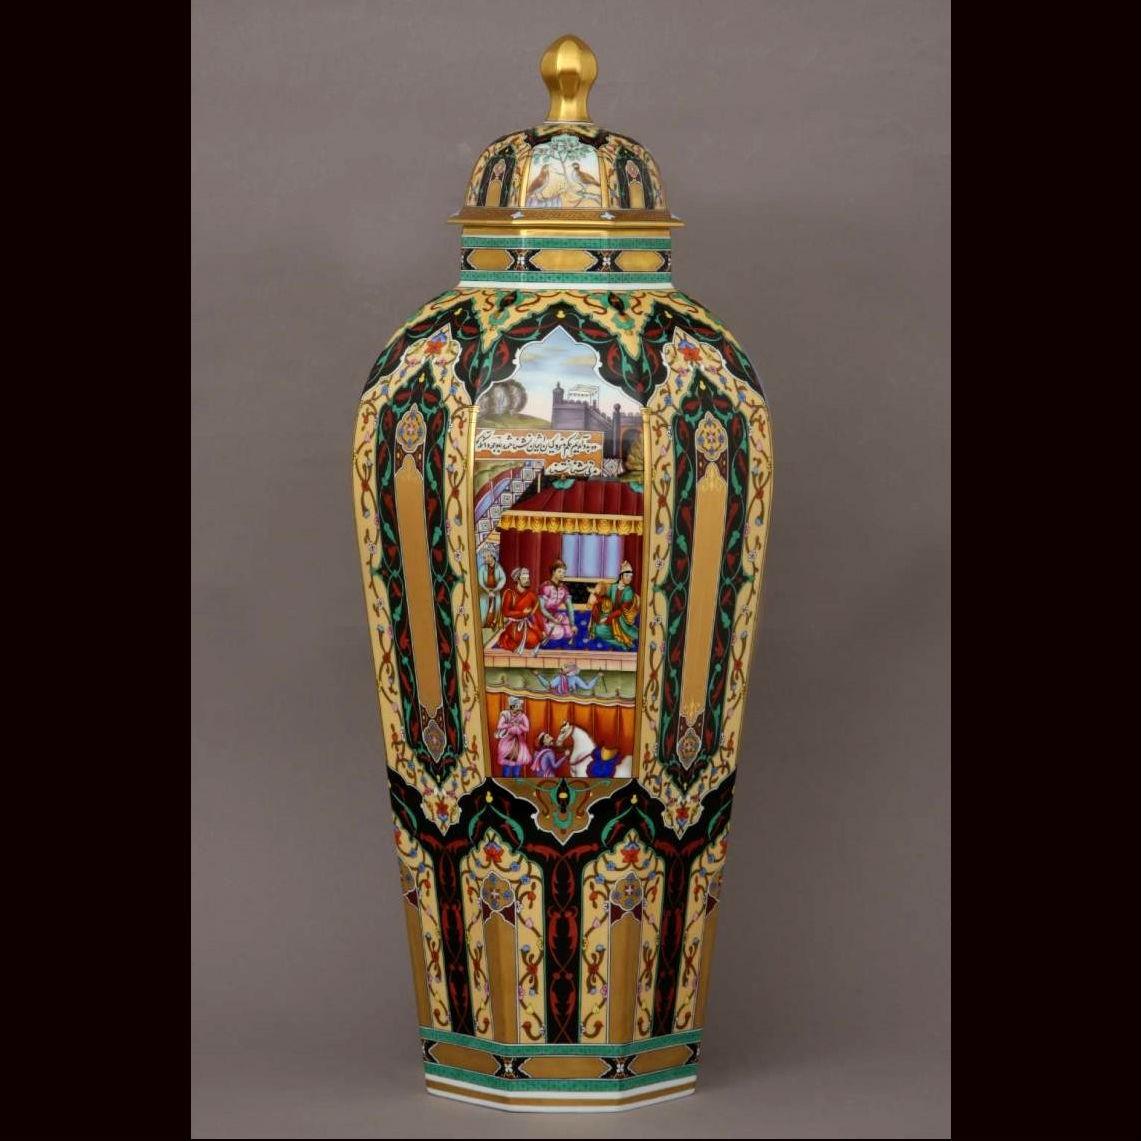 Vase, button knob - Limited to 50 pcs.